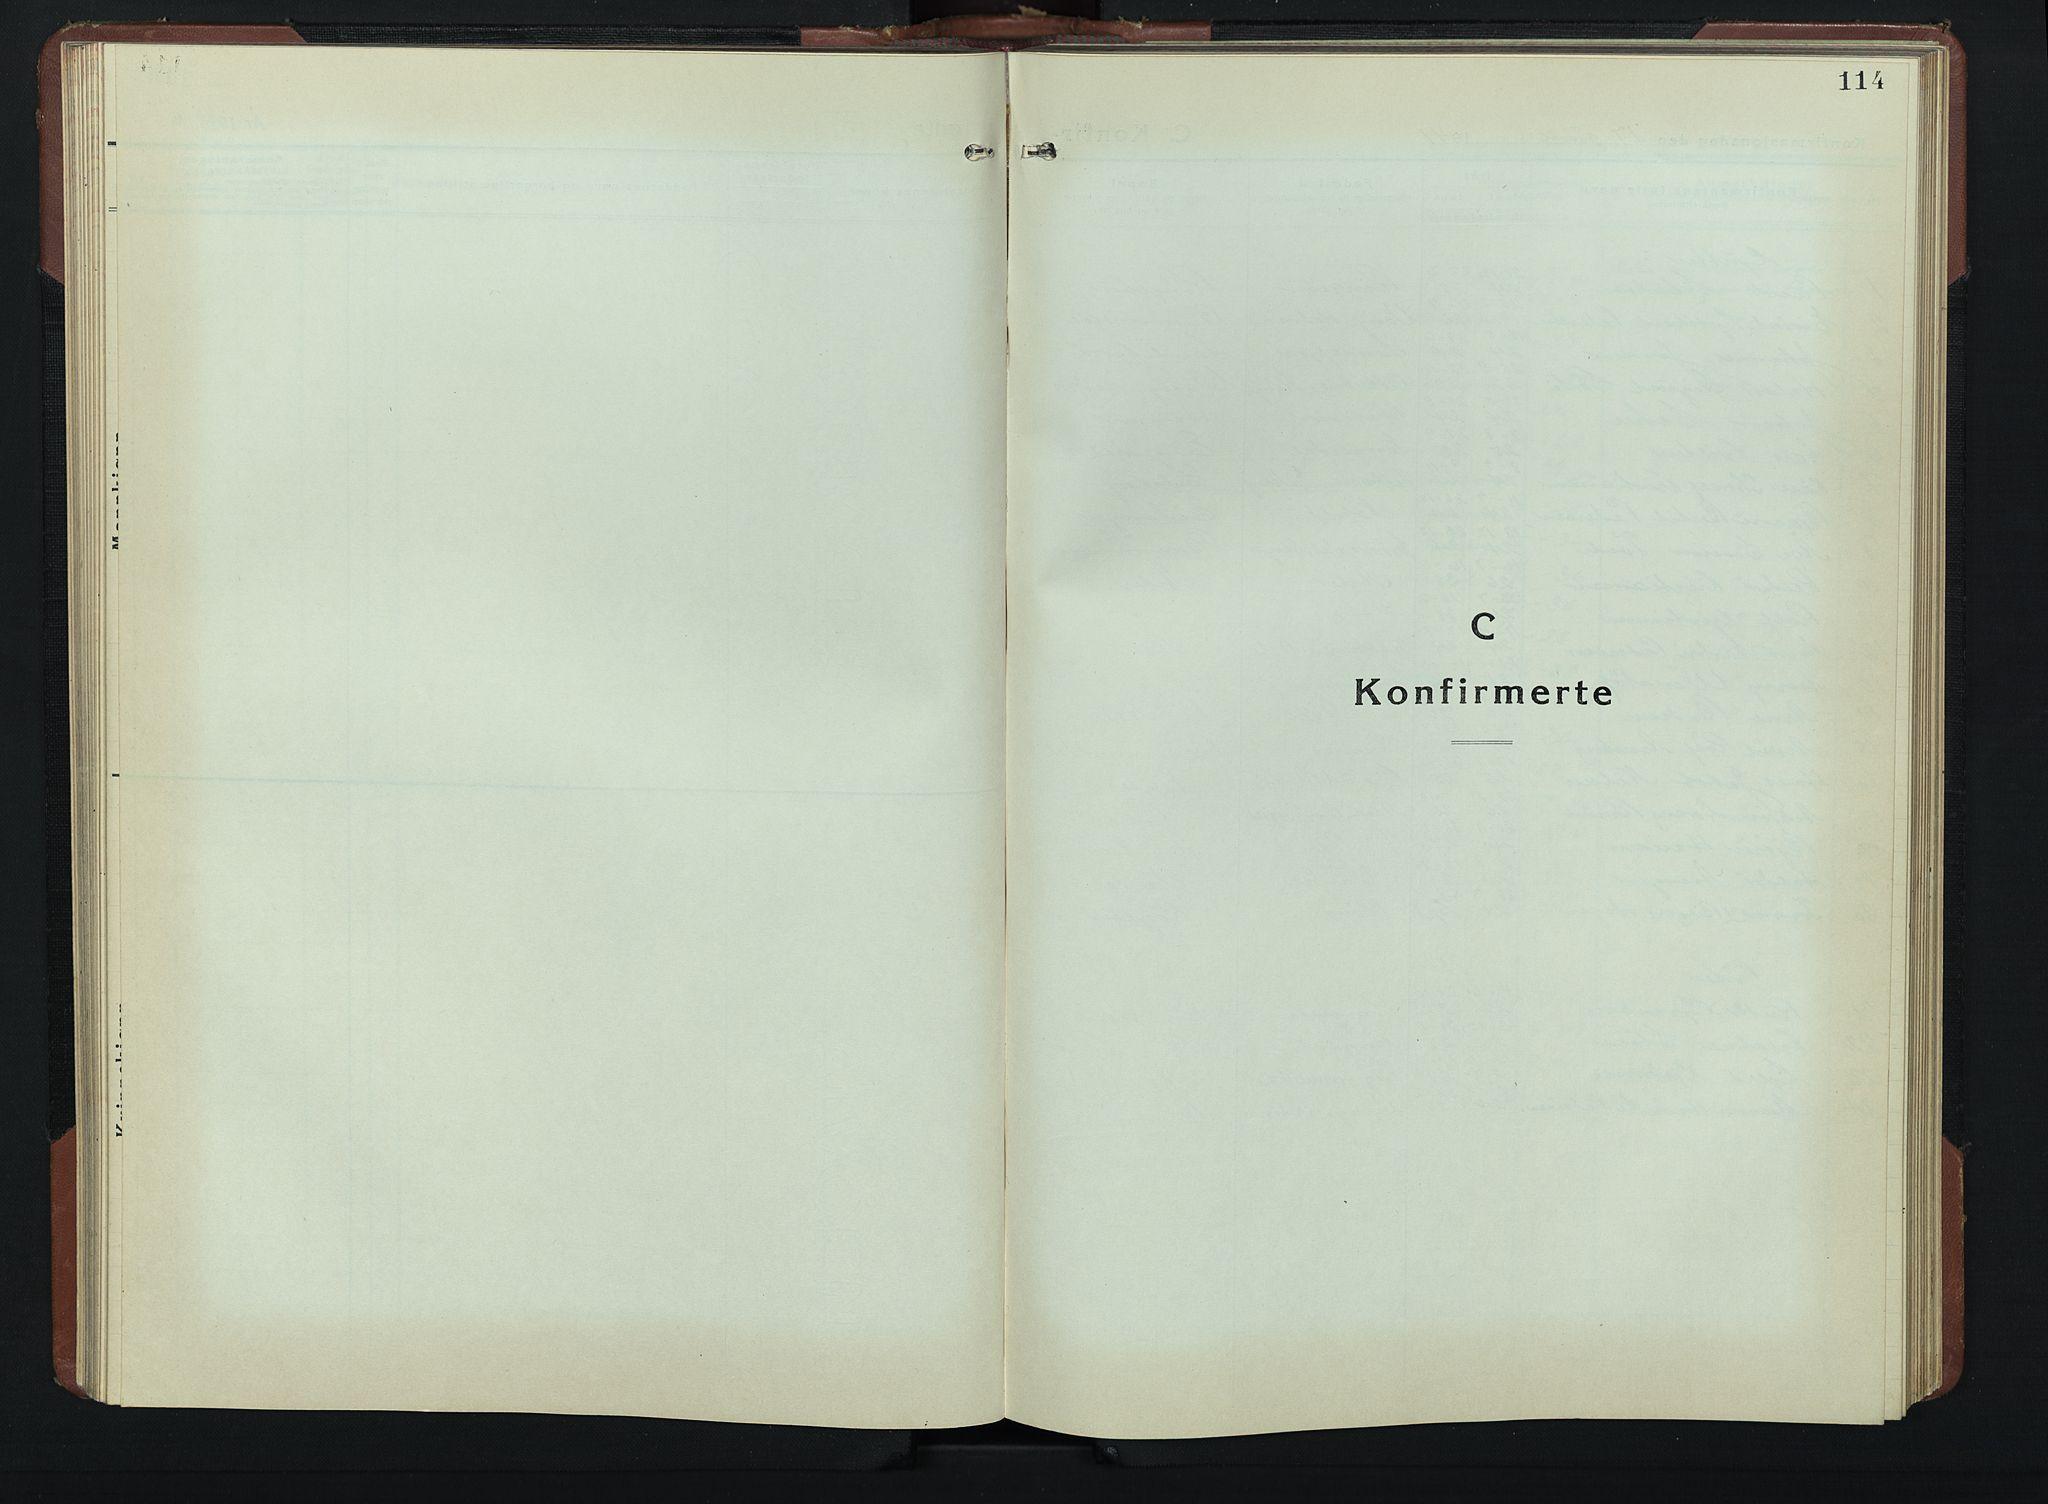 SAH, Vardal prestekontor, H/Ha/Hab/L0019: Klokkerbok nr. 19, 1941-1951, s. 114